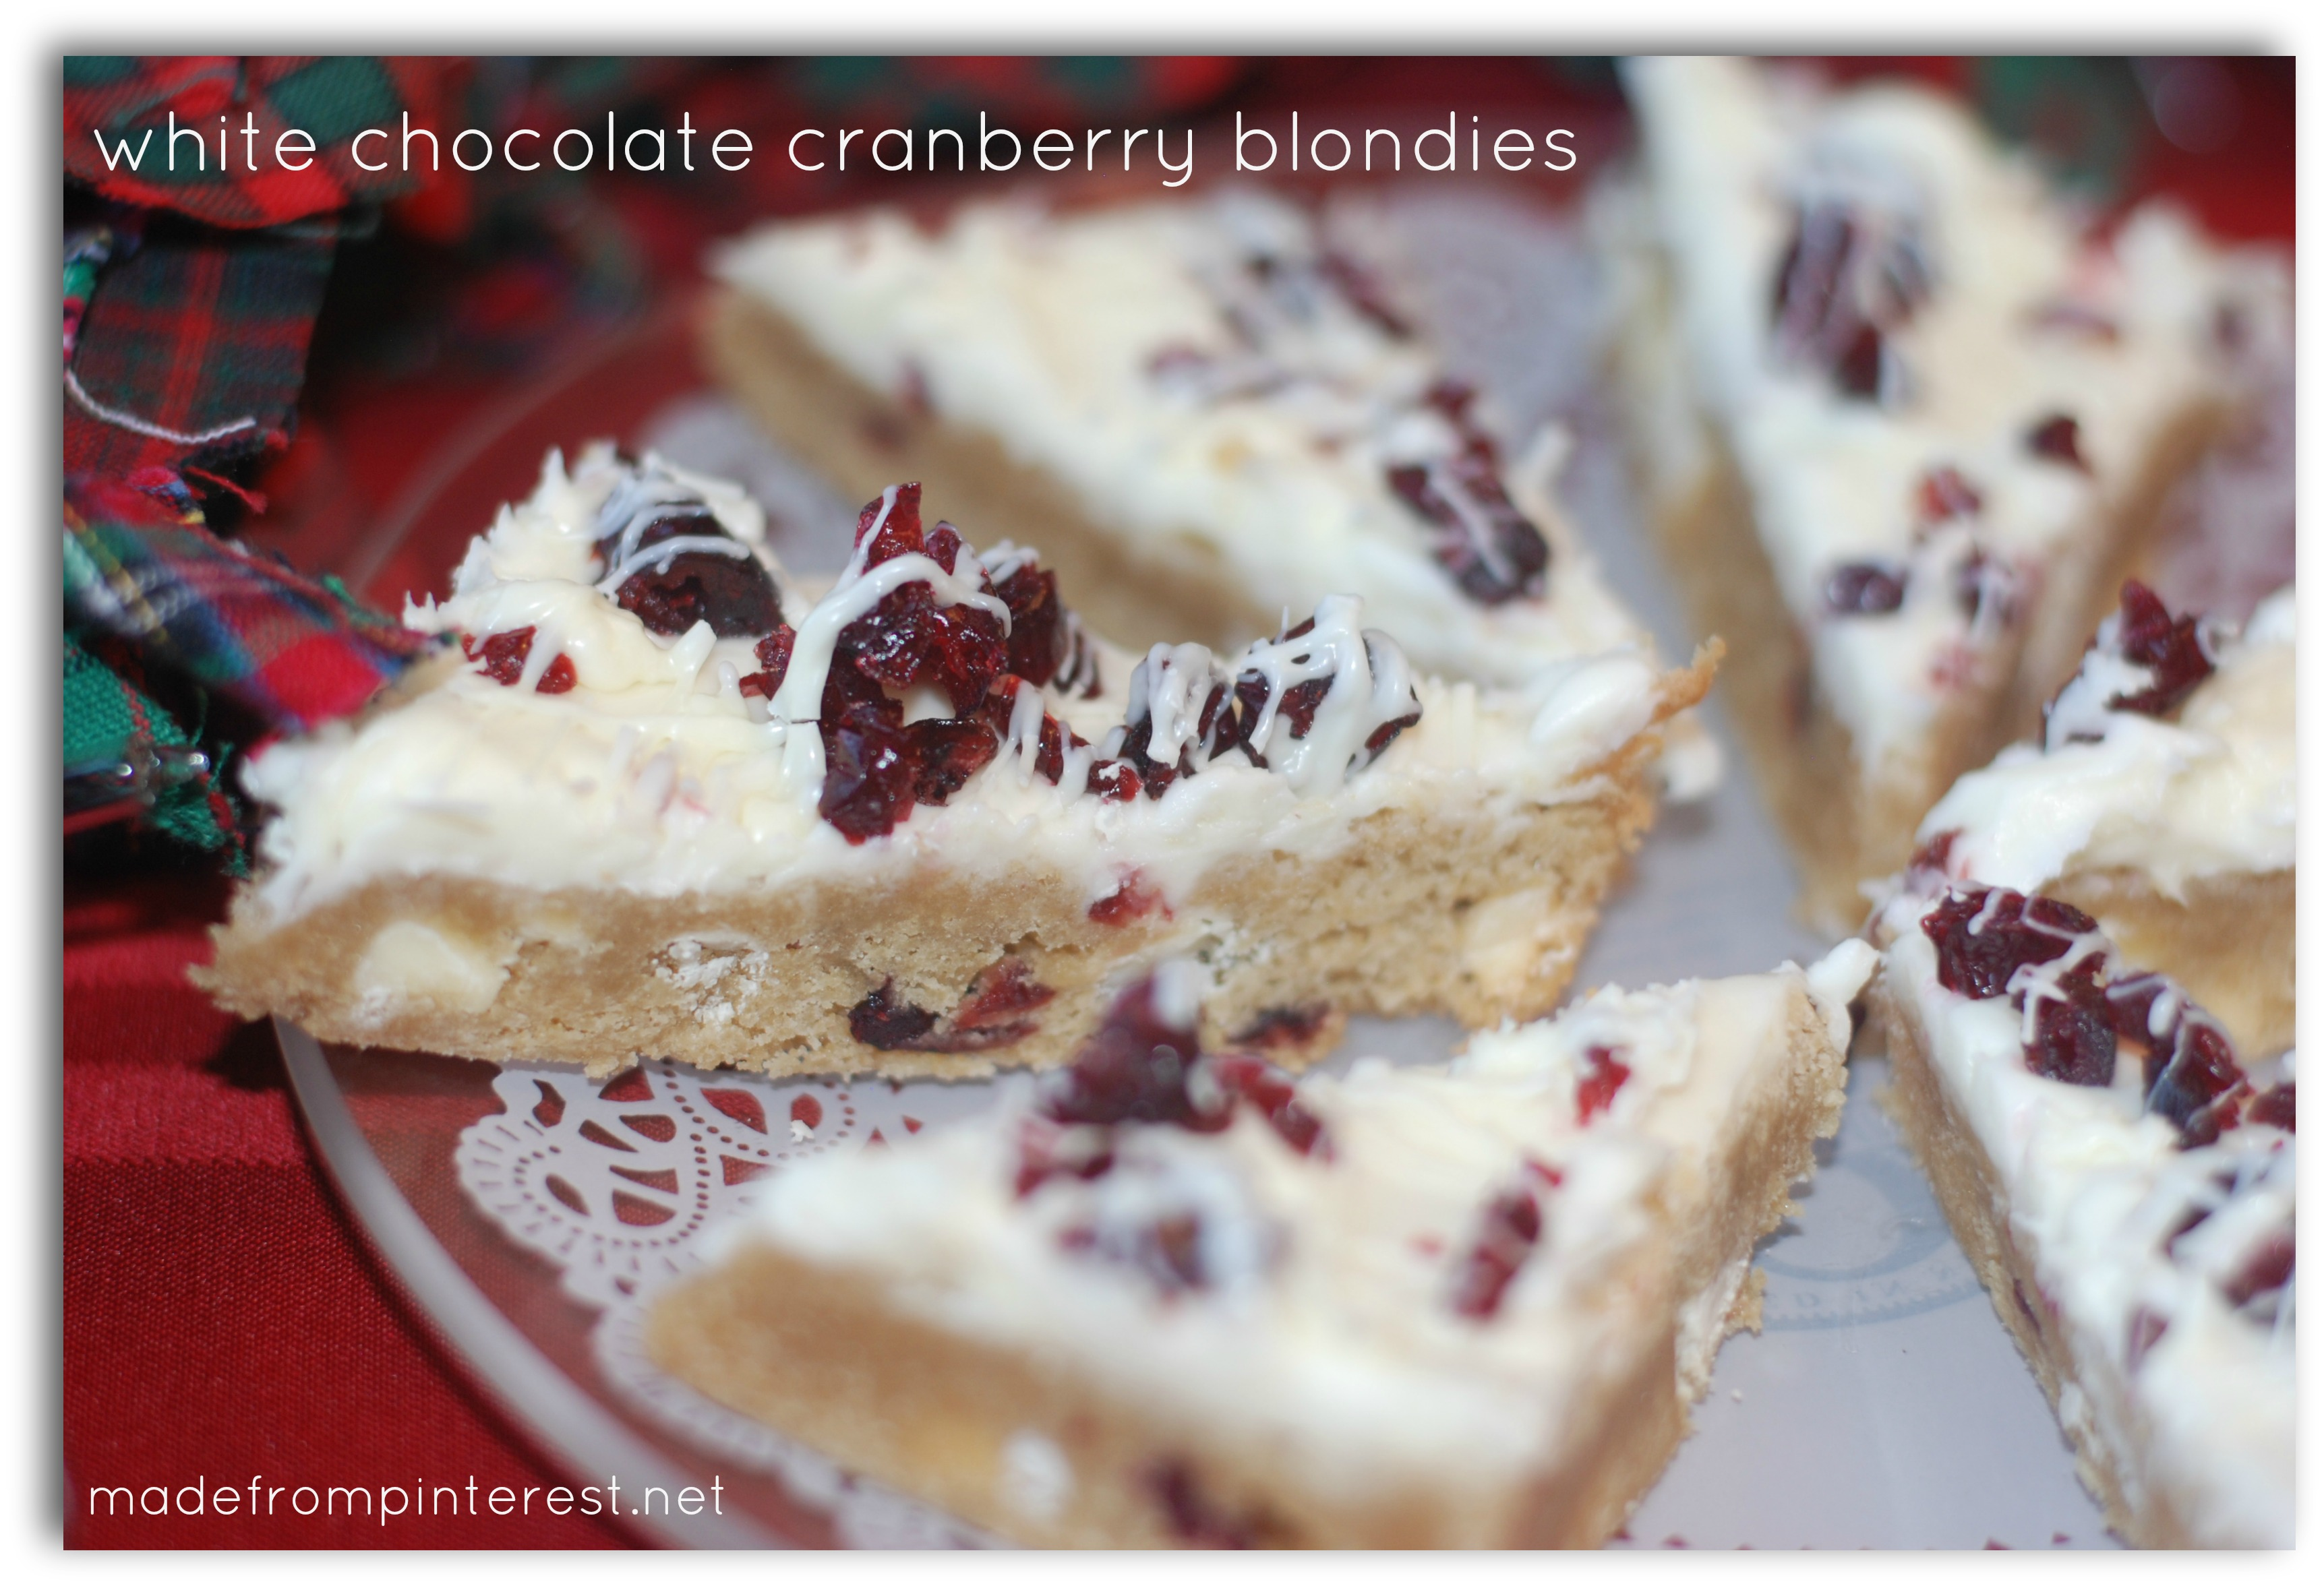 White Chocolate Cranberry Blondies - TGIF - This Grandma is Fun